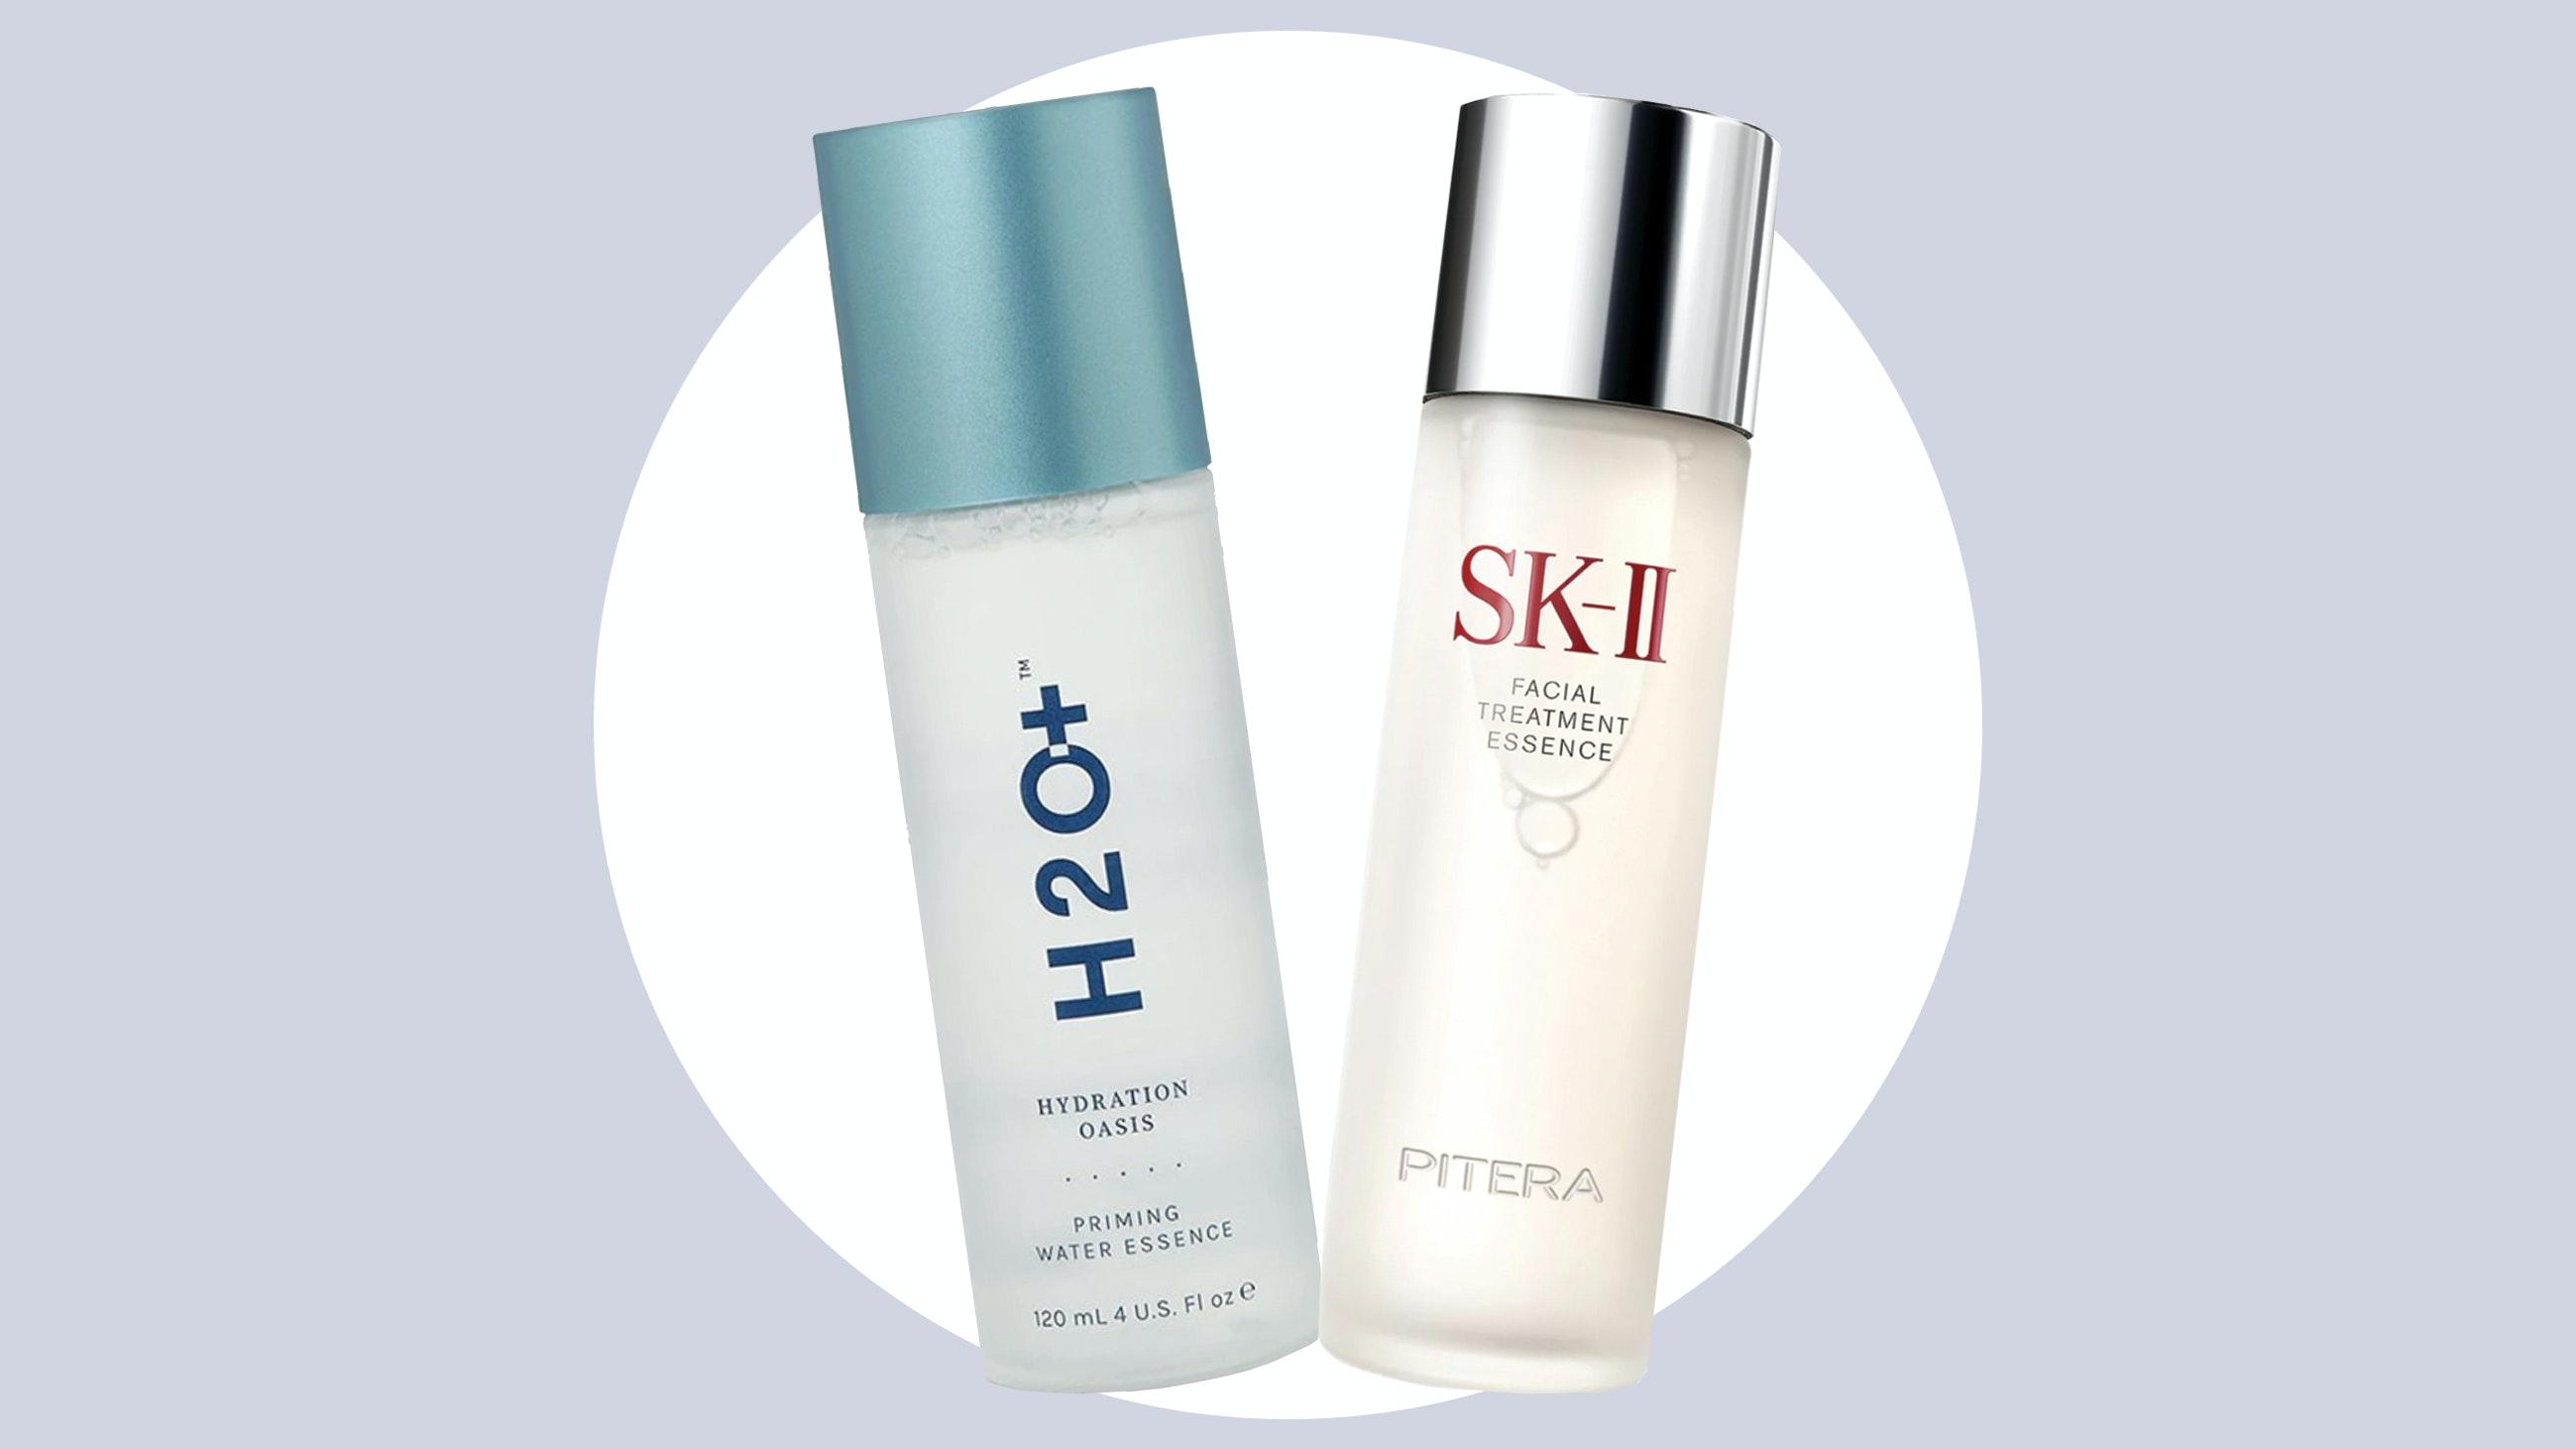 essence in skin care skii essence and h2O + essence